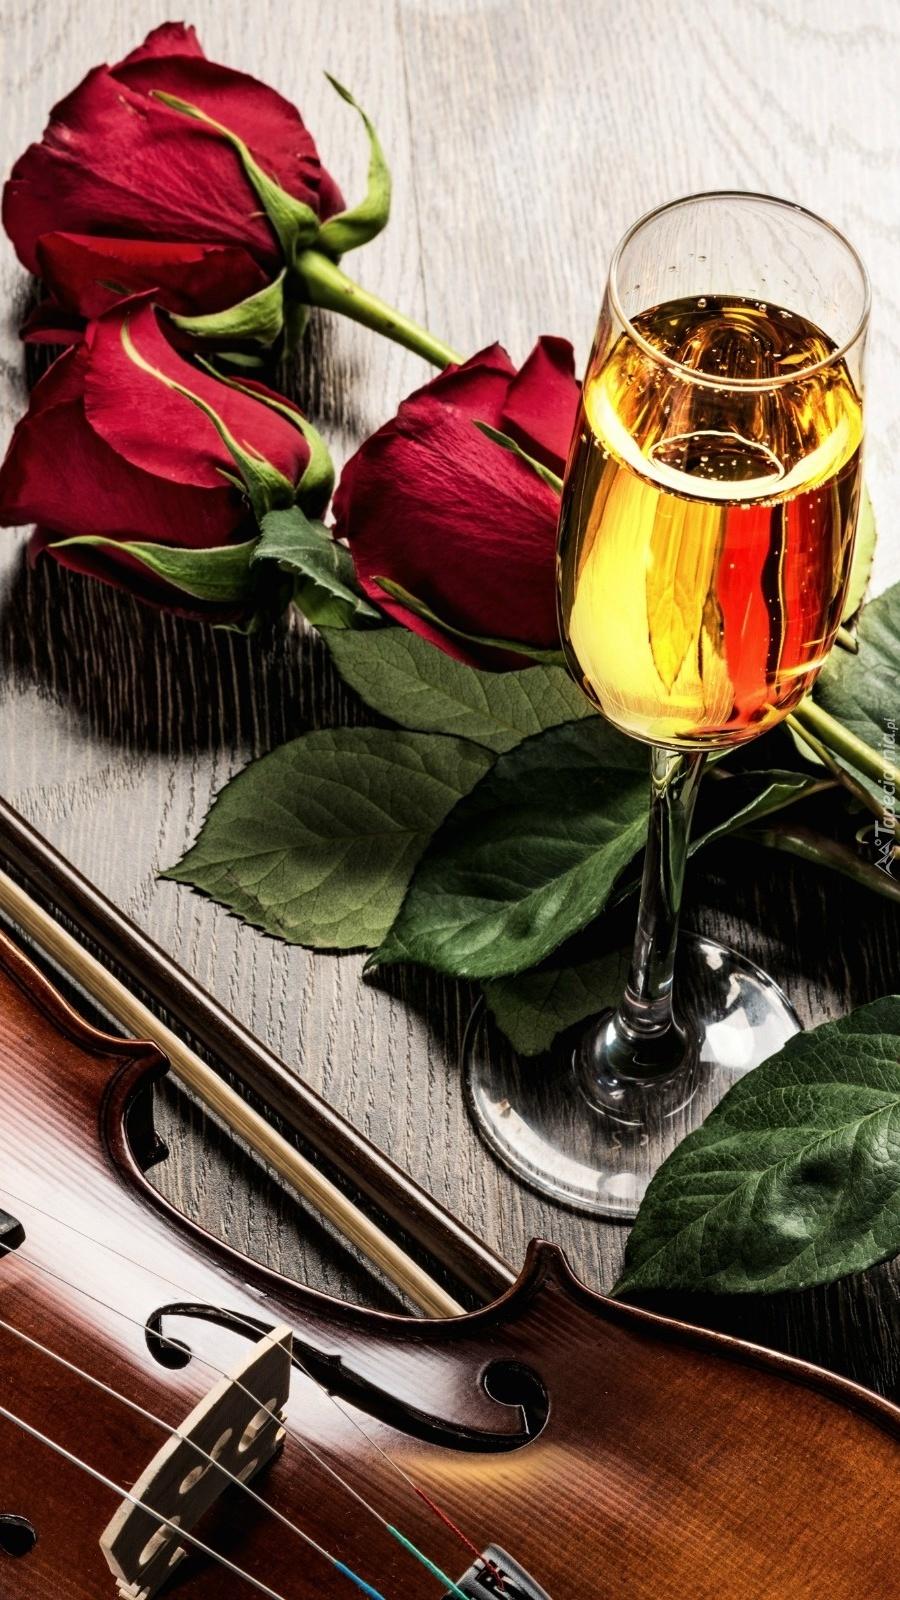 Skrzypce obok lampki wina i róż